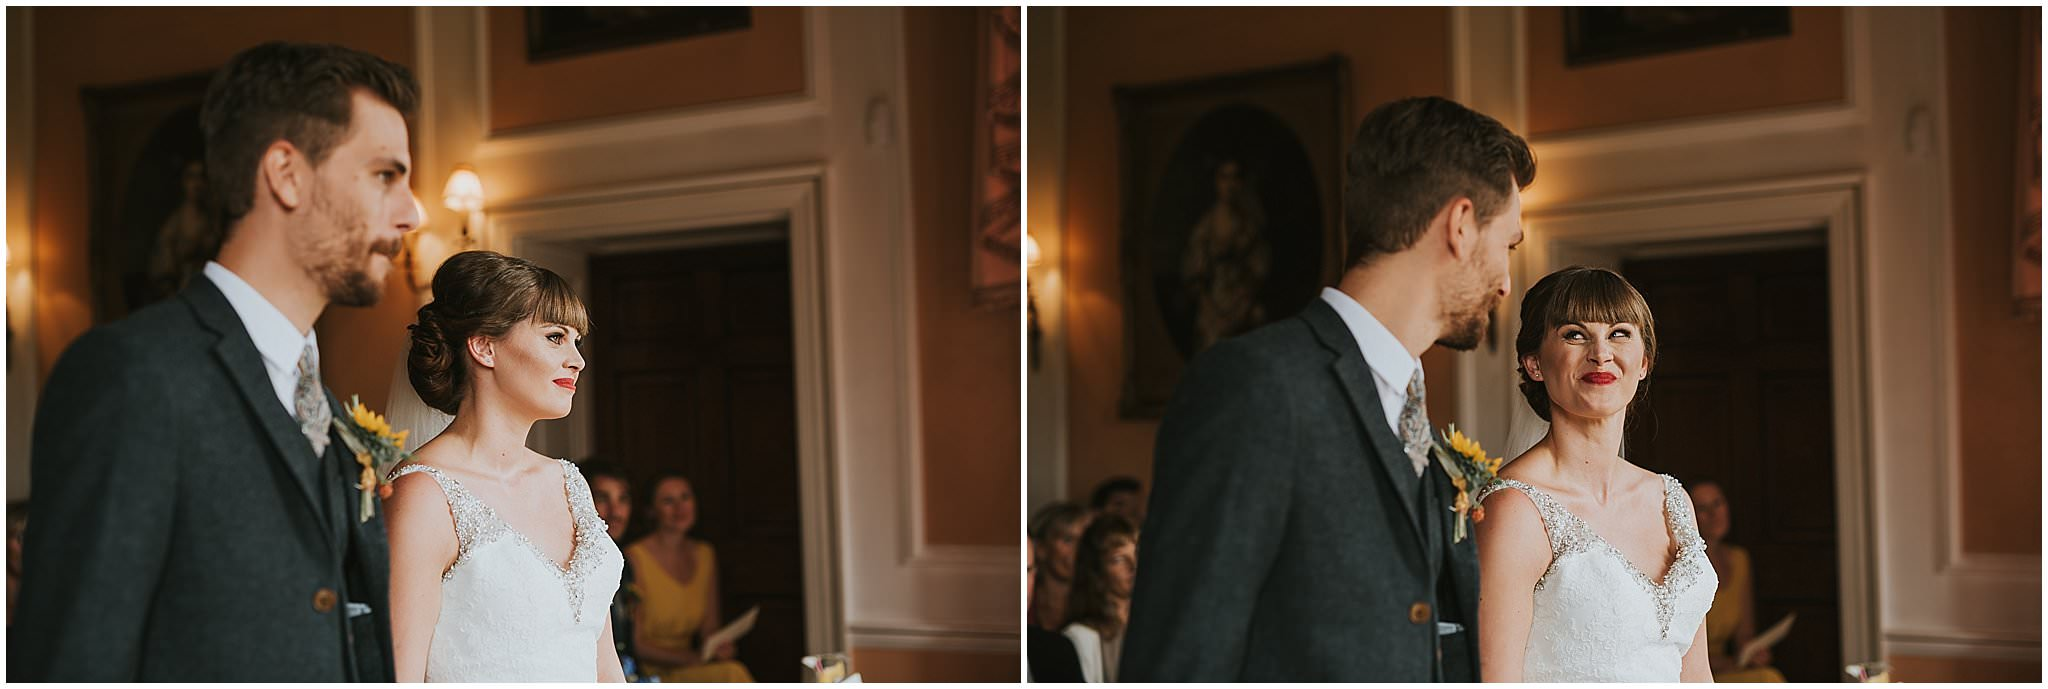 Orchardleigh house wedding photographer_0778